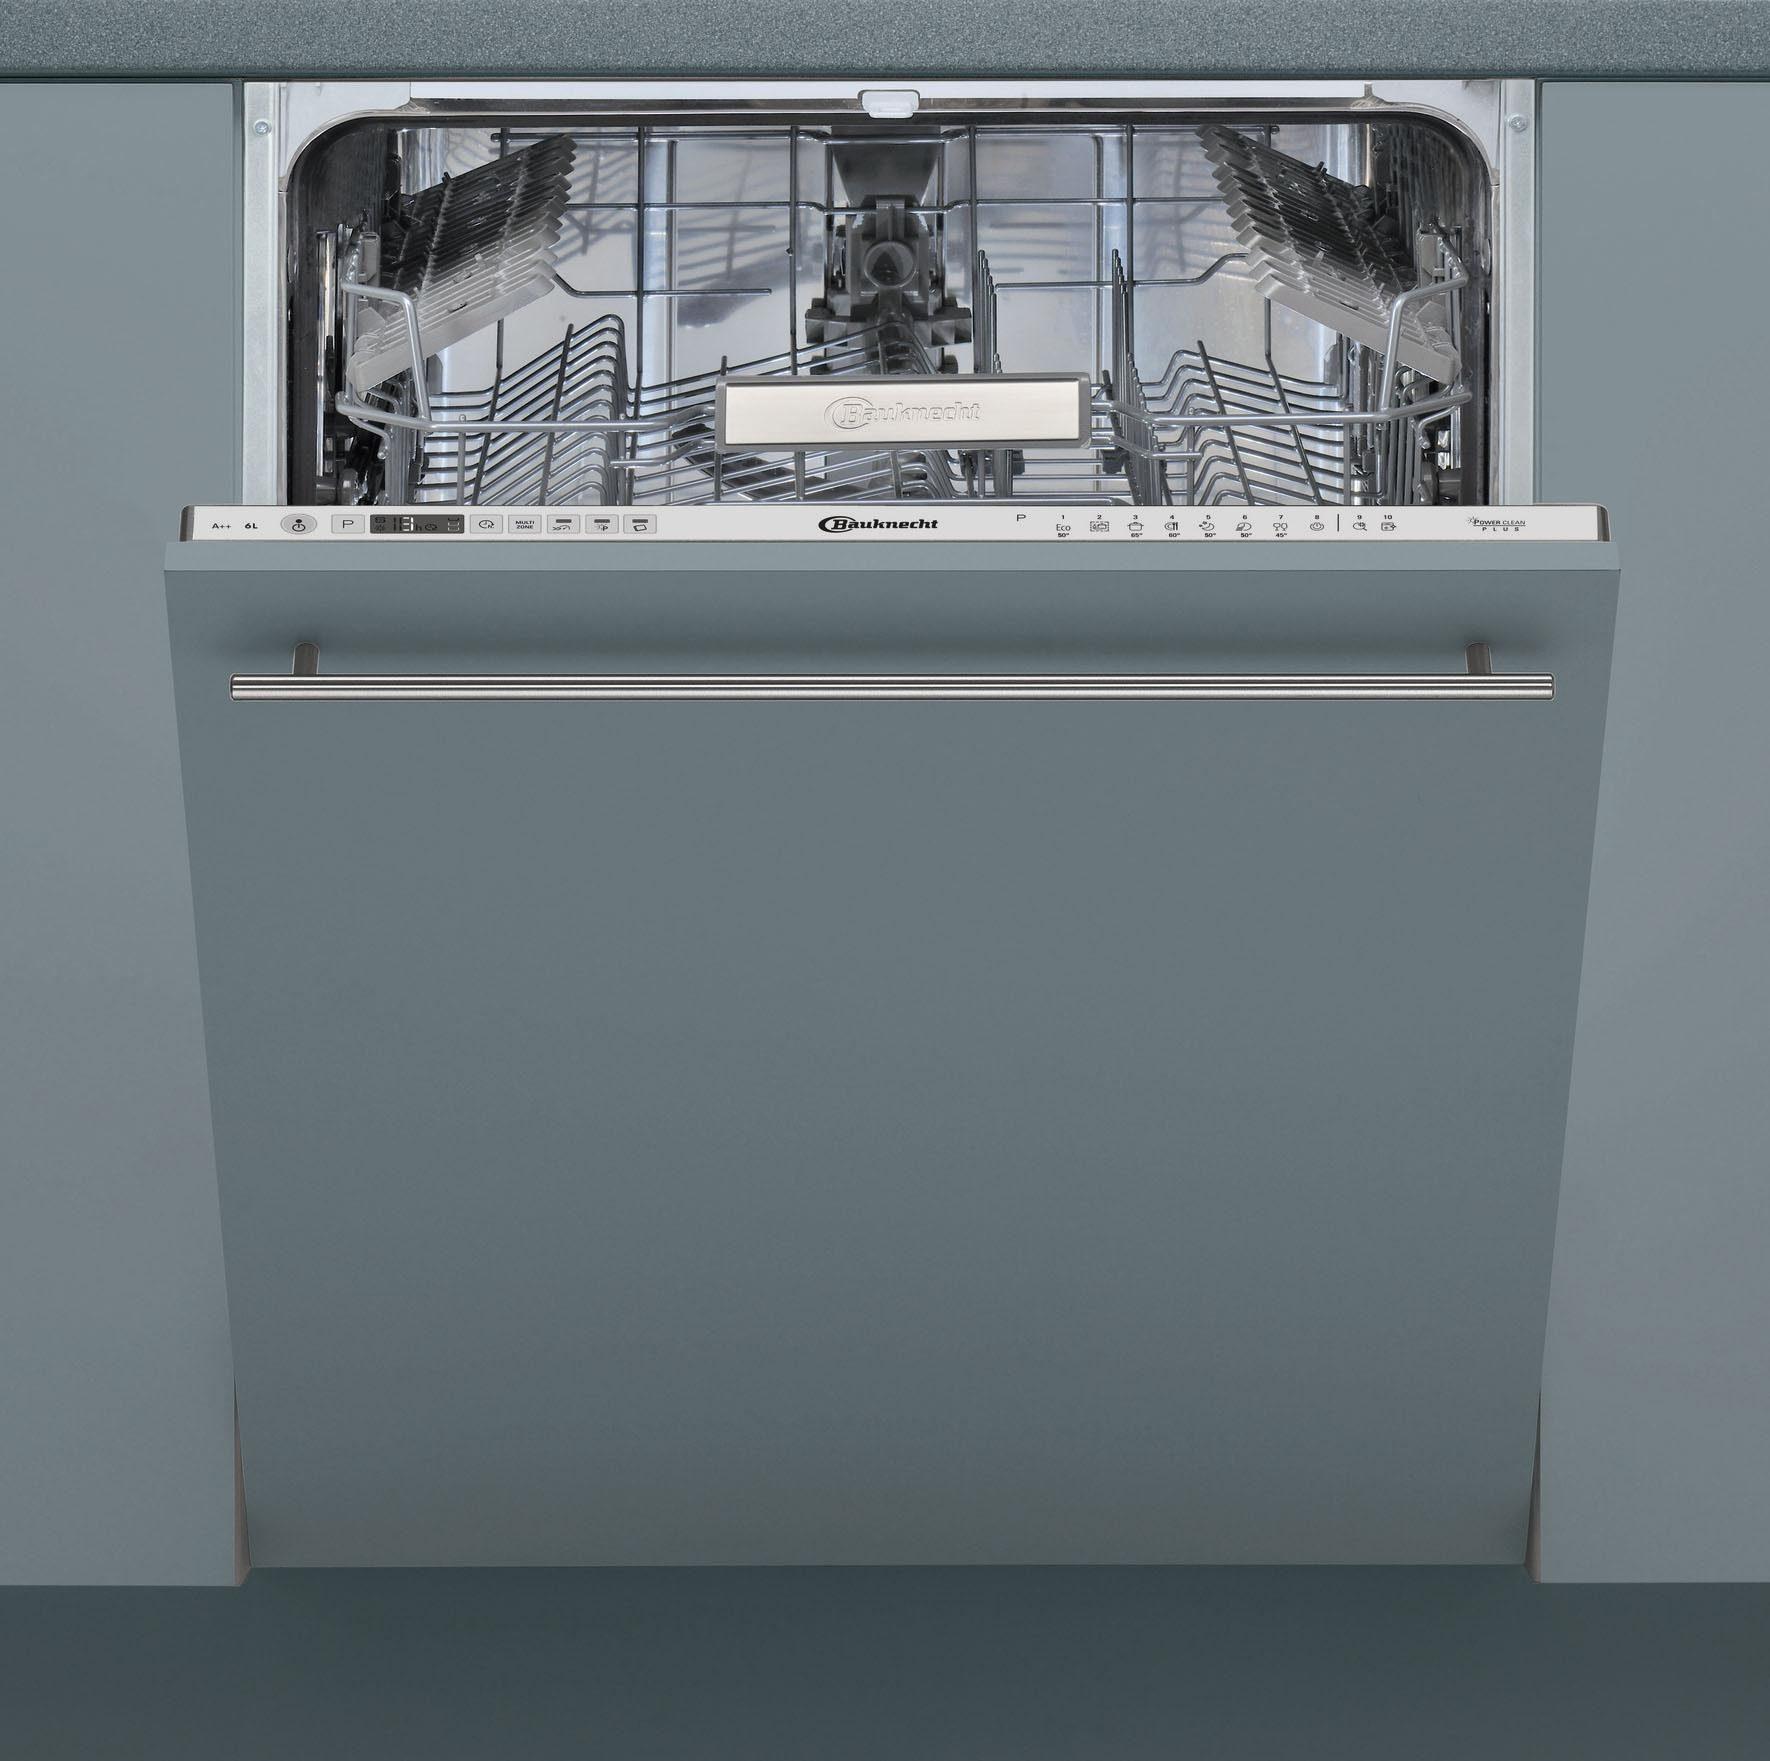 BAUKNECHT Vollintegrierbarer Einbaugeschirrspüler BIO3T323PE6M, A++, 6 Liter, 14 Maßgedecke